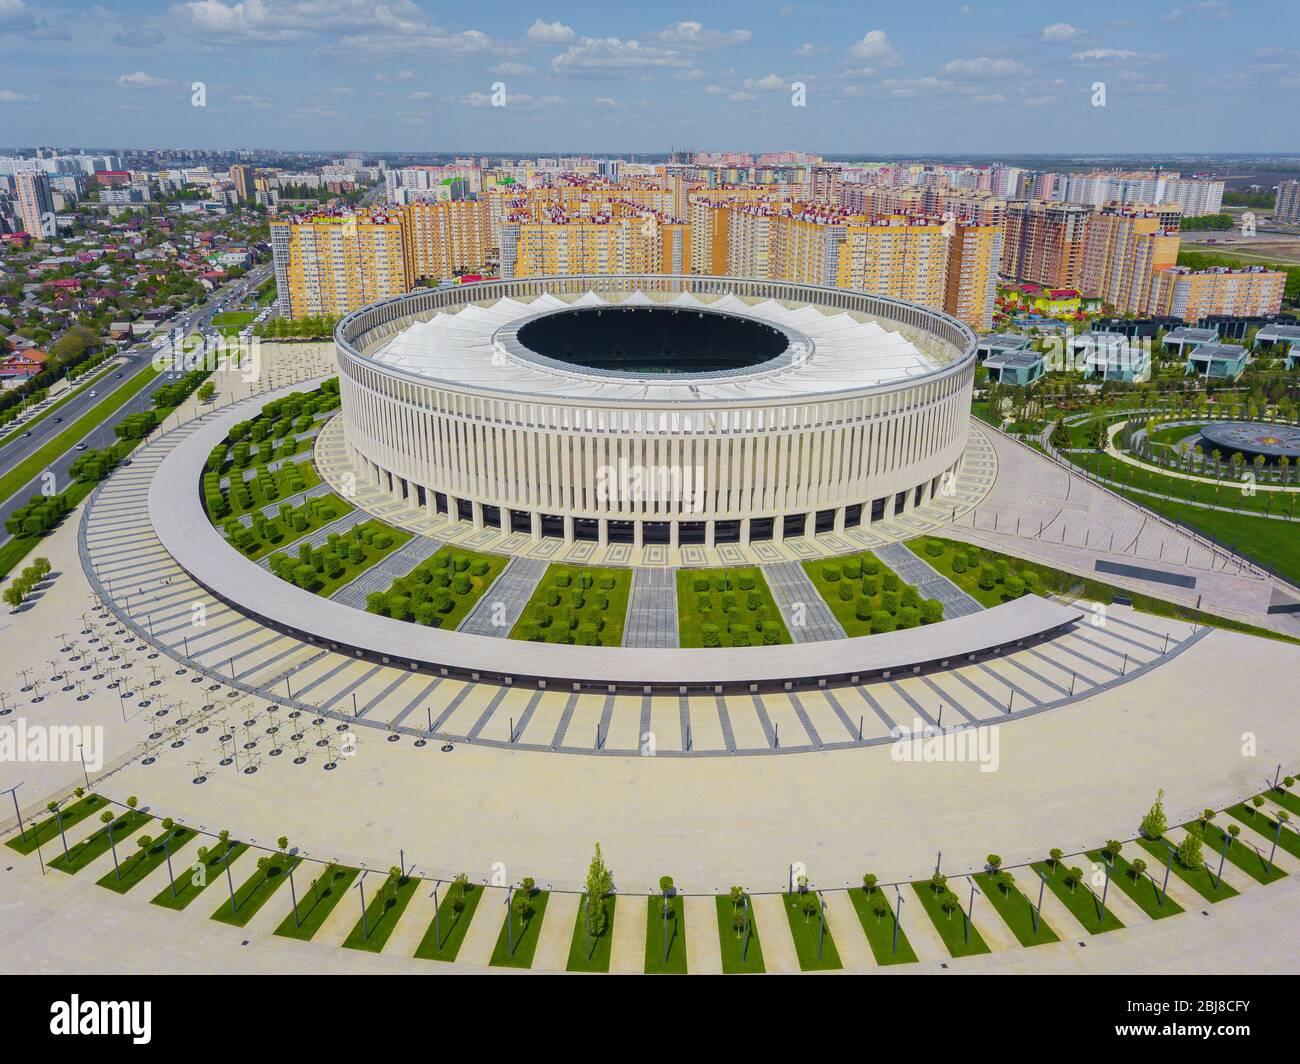 Krasnodar Cityscape And Fc Krasnodar Stadium From Aerial View Stock Photo Alamy